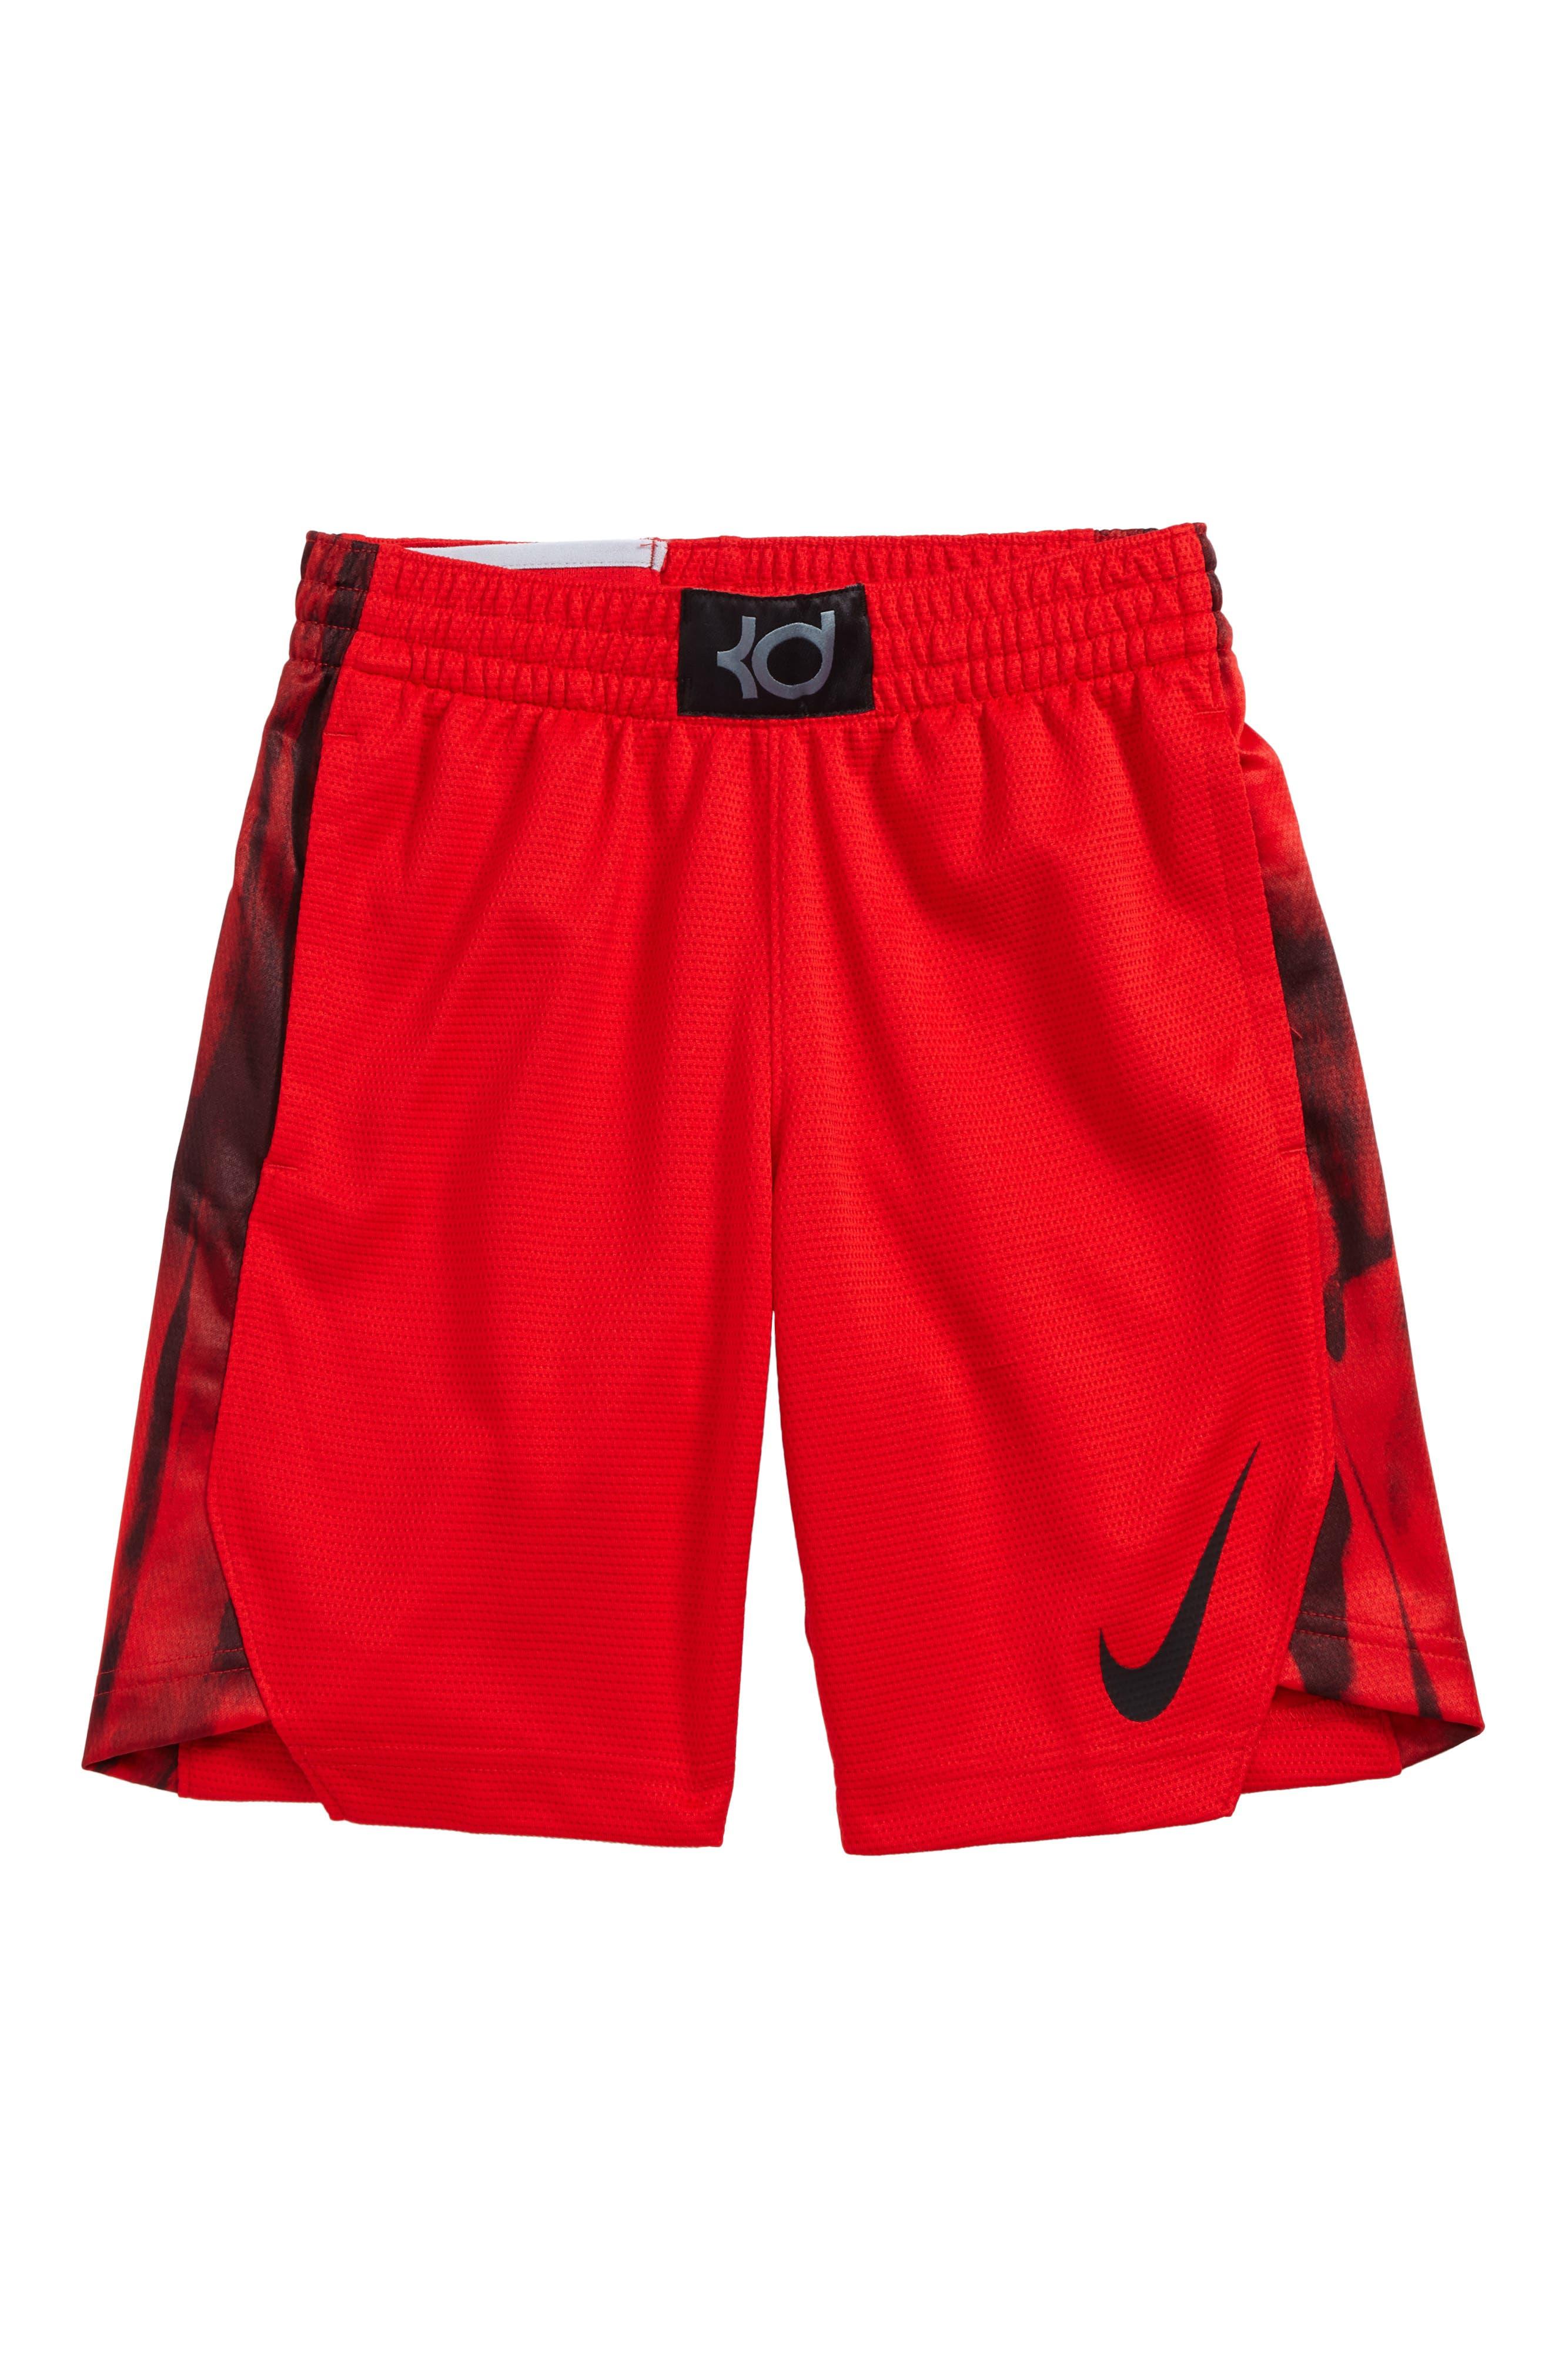 Kevin Durant Elite Shorts,                             Main thumbnail 3, color,